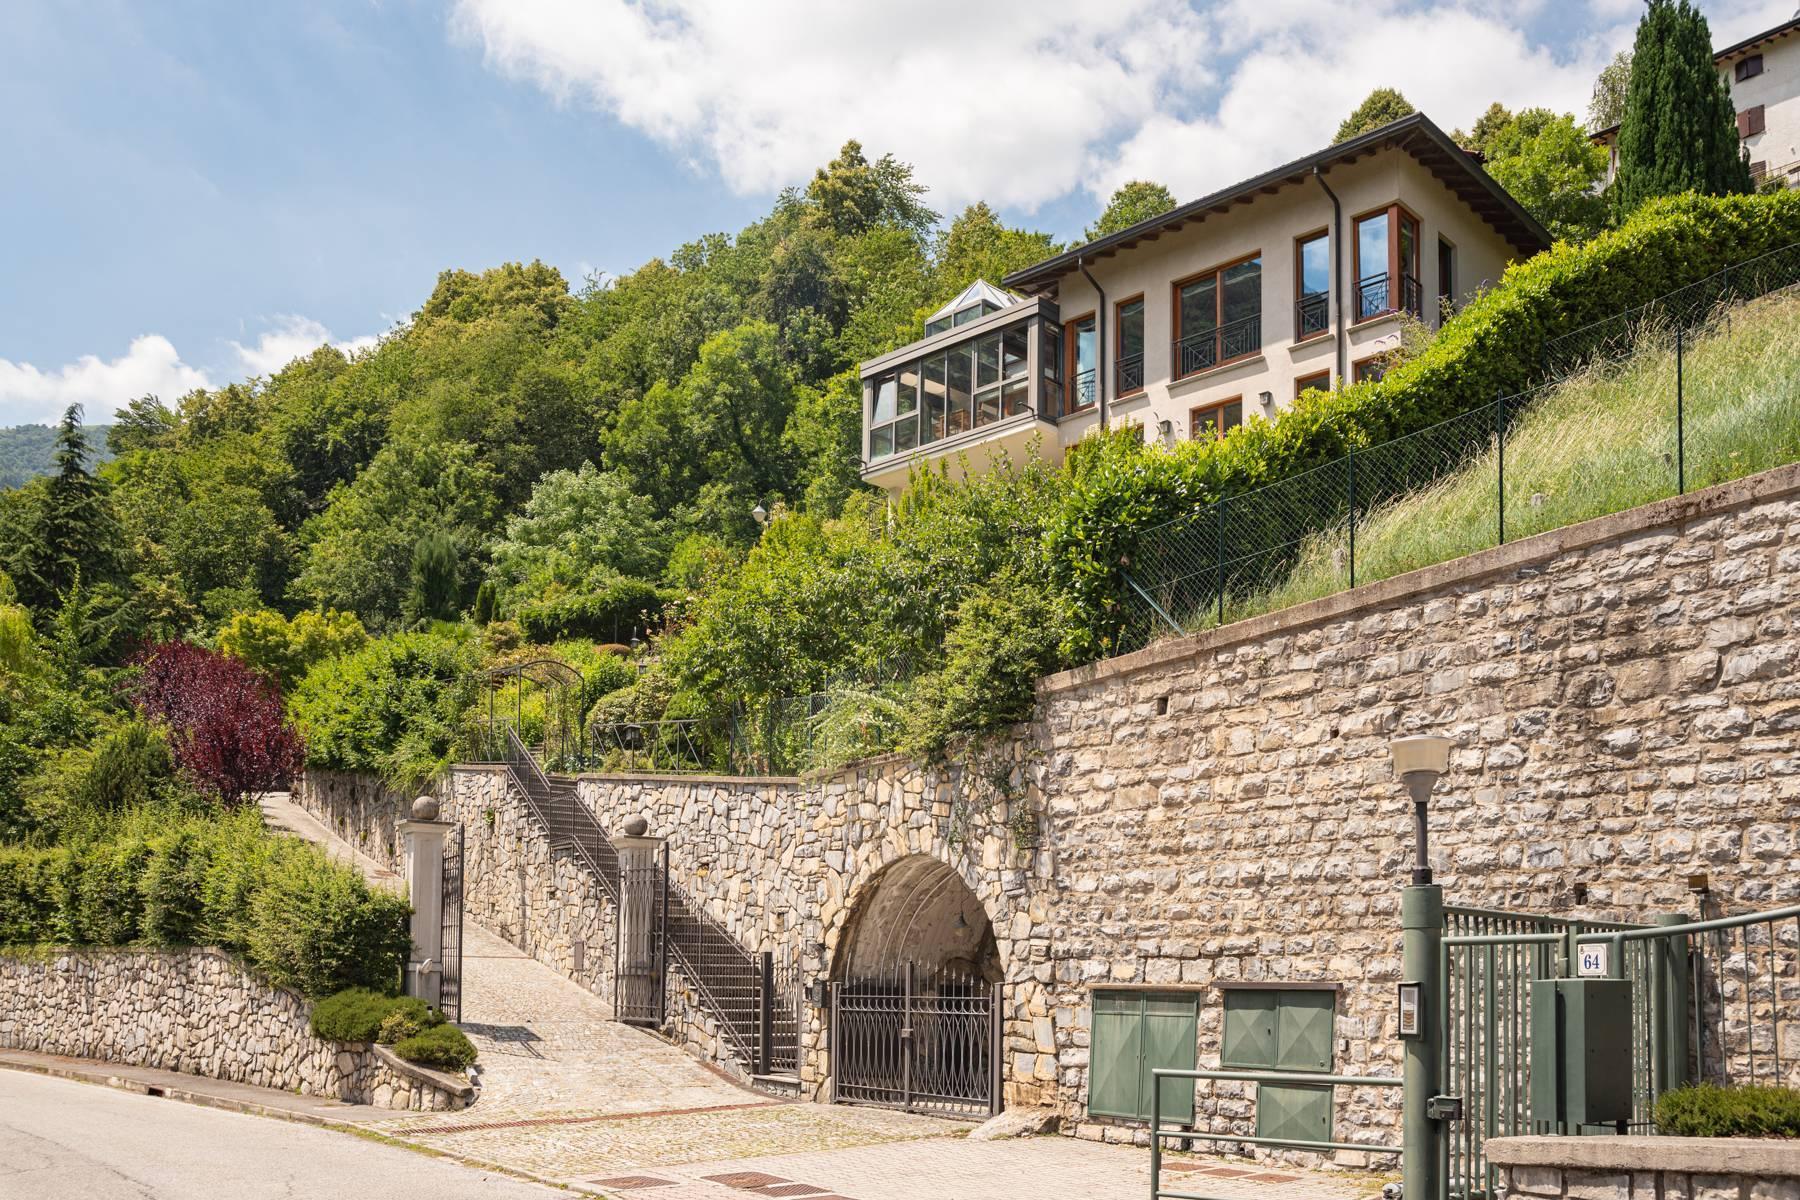 Splendida villa moderna sulla collina soleggiata sopra Argegno - 5